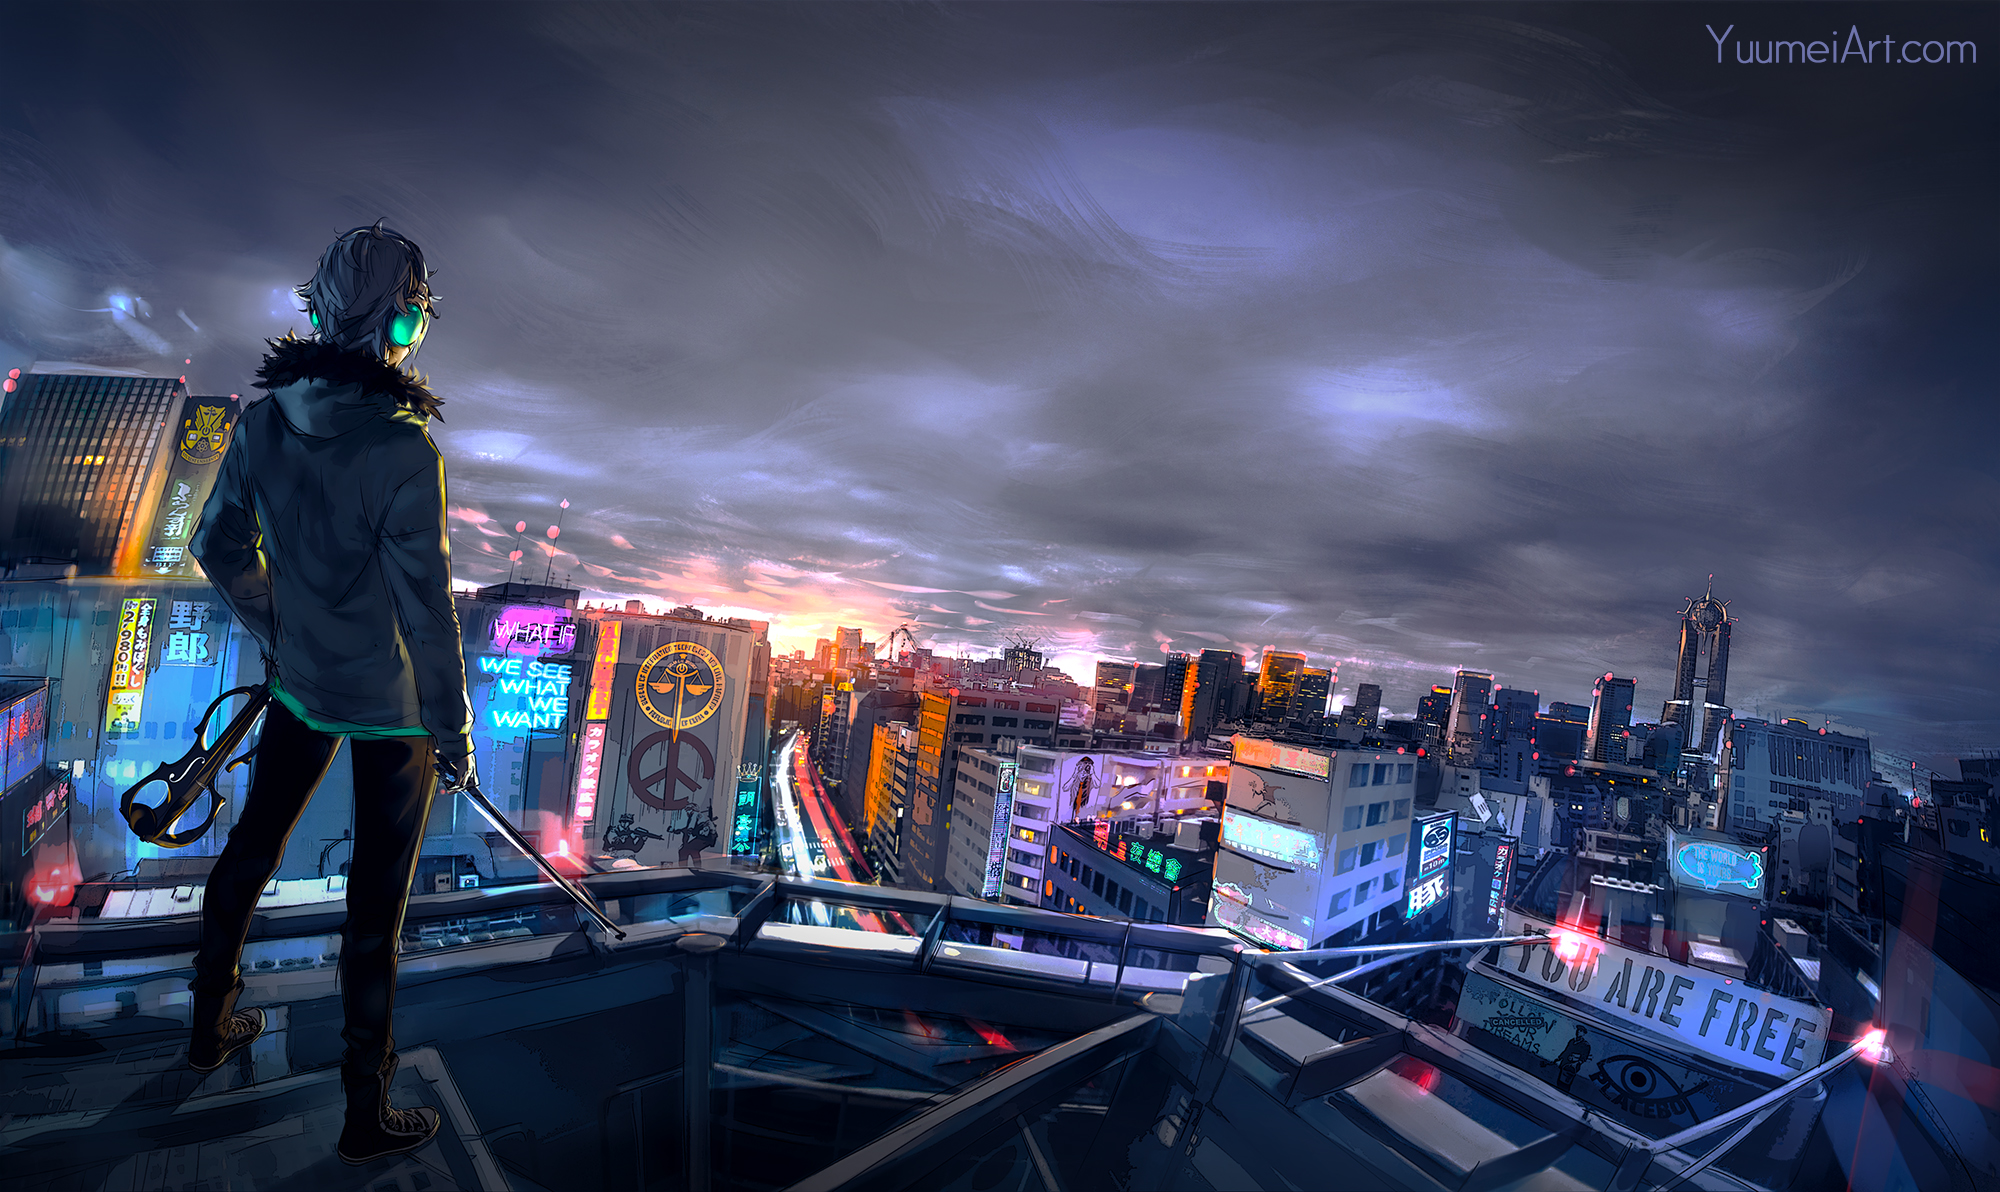 Apartment Inspiration Cyberpunk Cityscape Hd Artist 4k Wallpapers Images